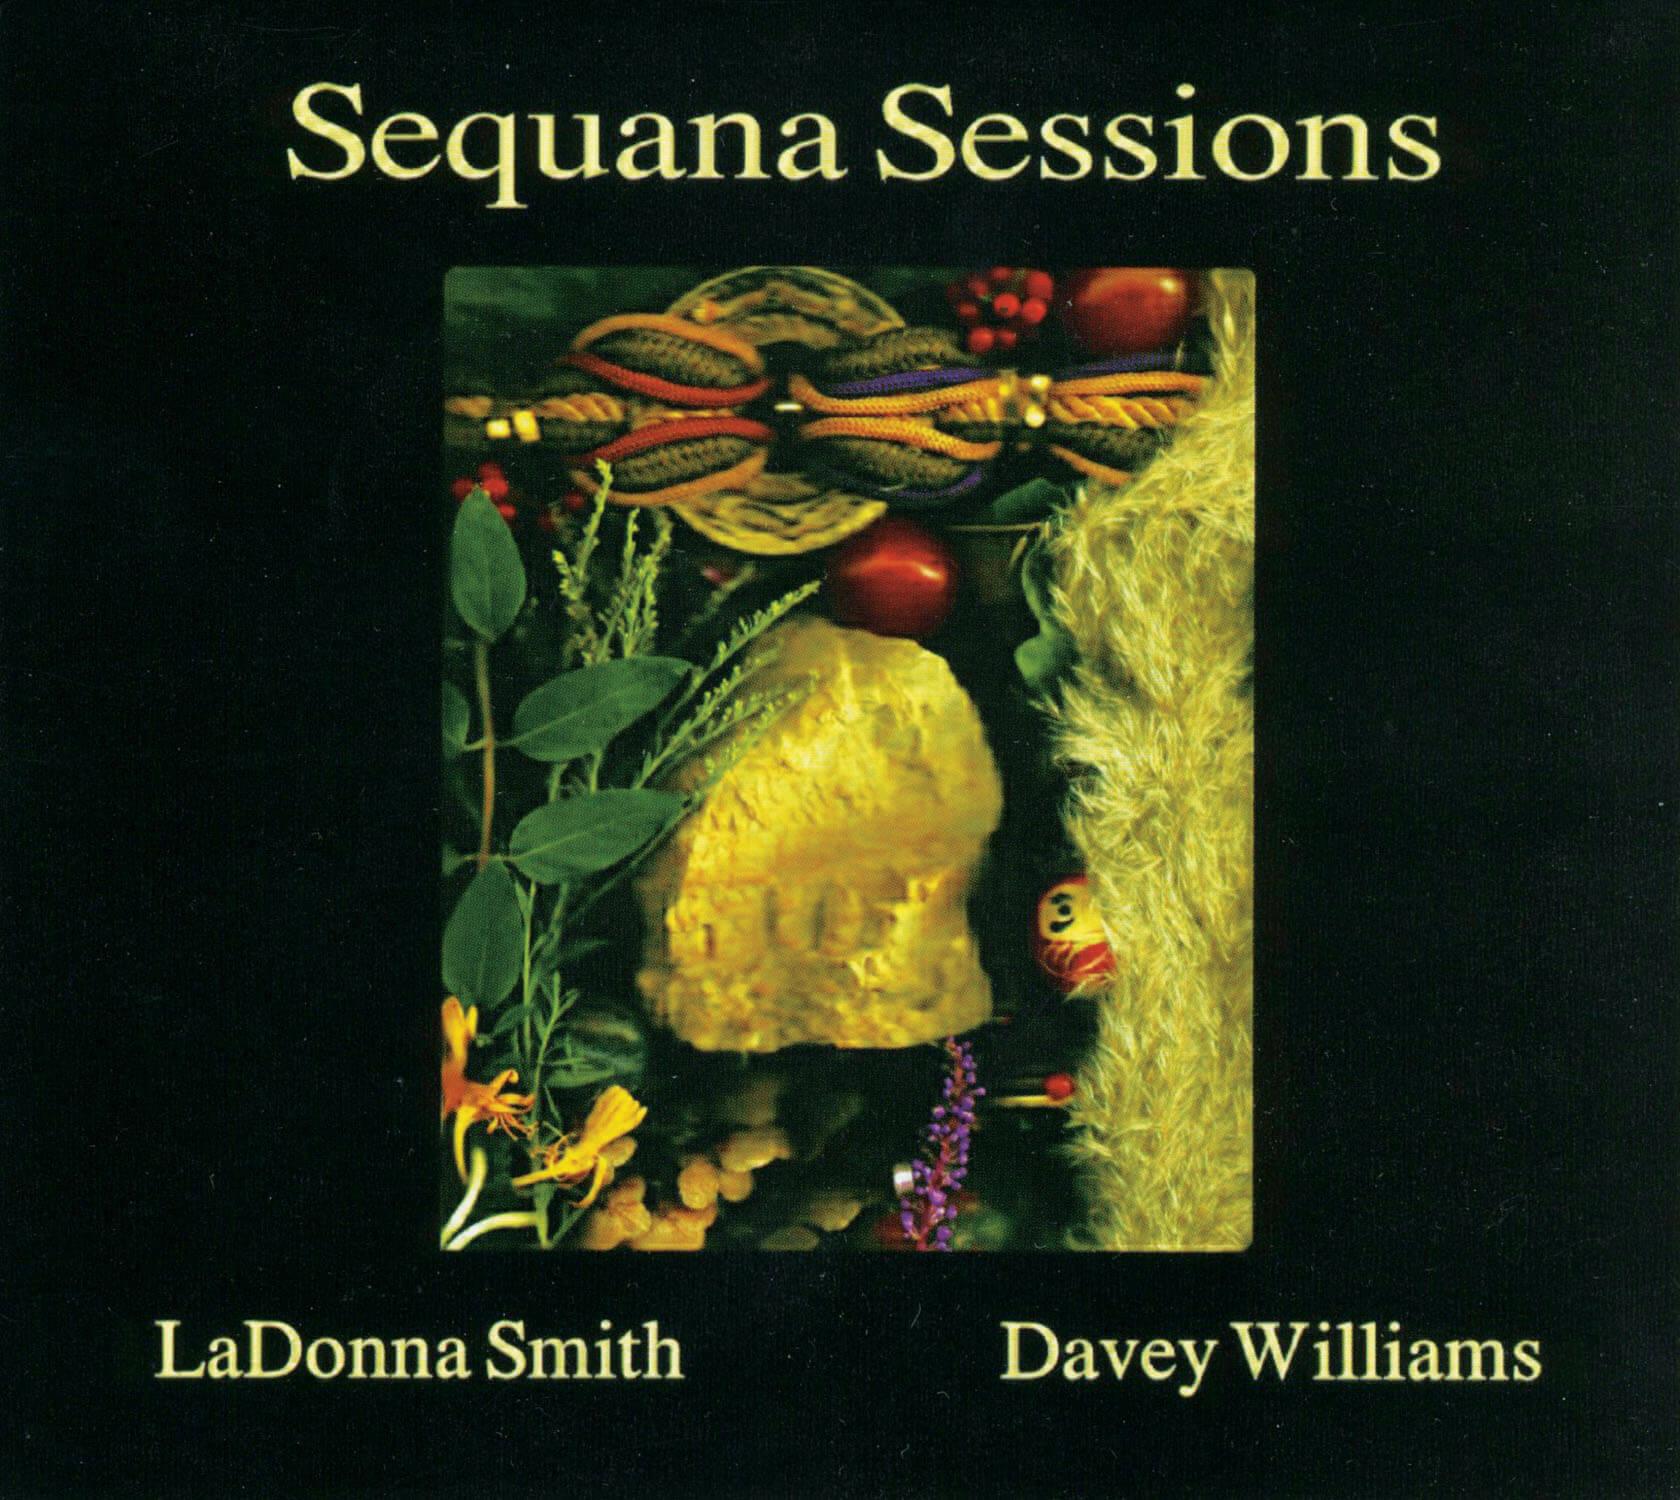 Sequana Sessions